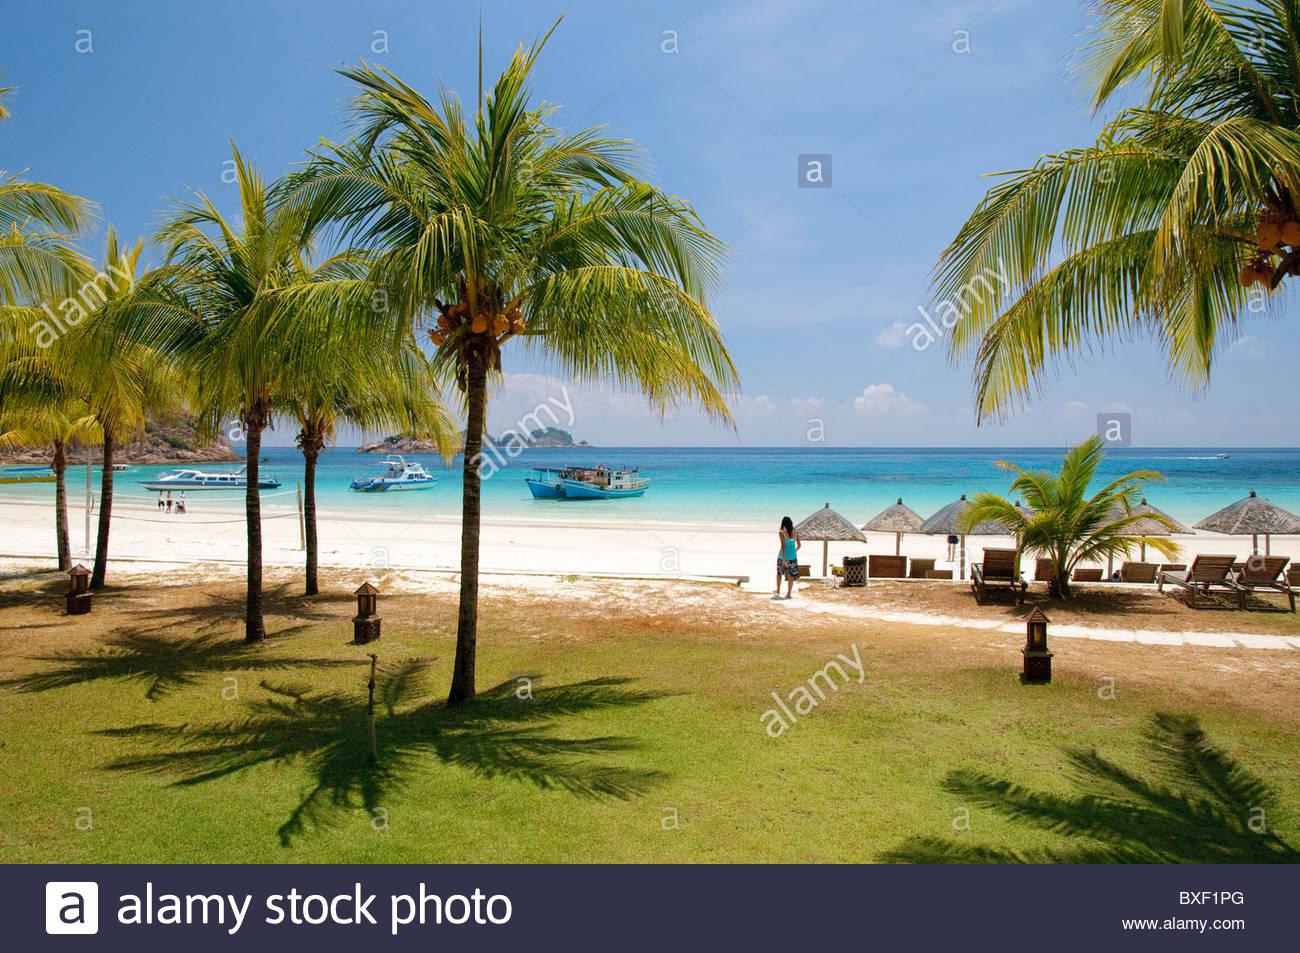 Beach with palm trees, Pulau Redang island, Malaysia, Southeast Asia, Asia Stock Photo